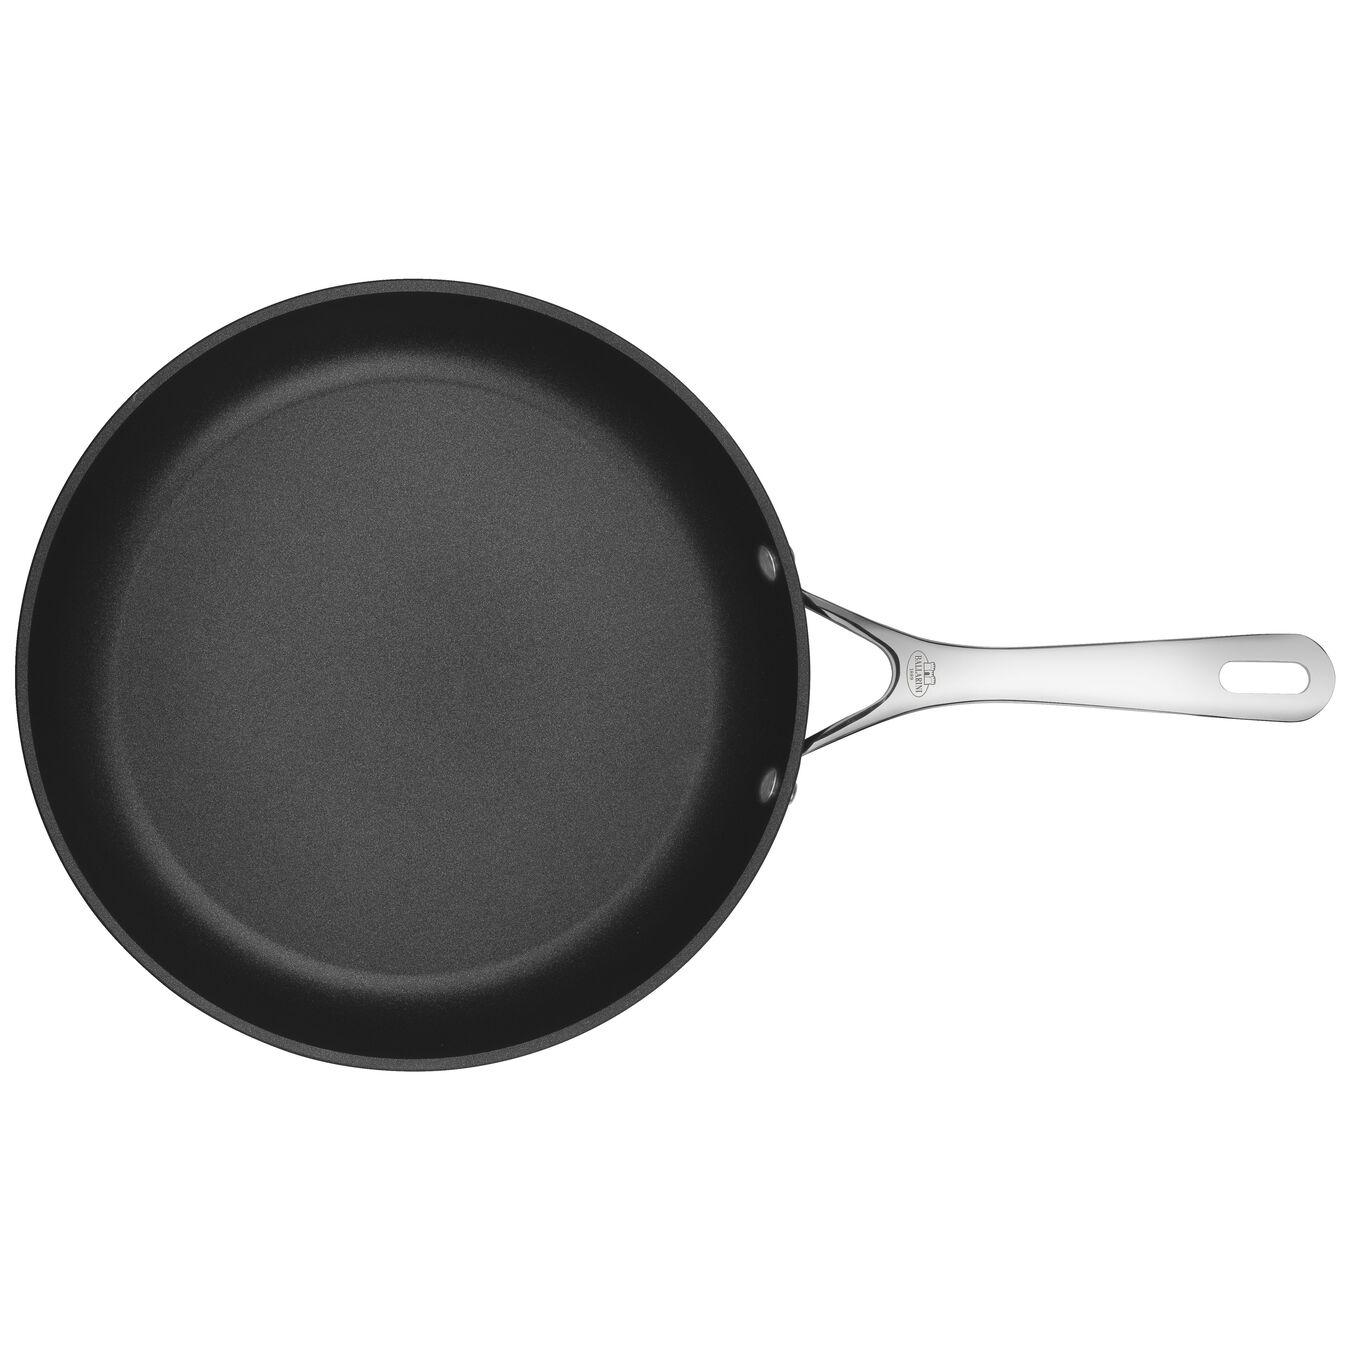 30 cm / 12 inch Frying pan,,large 3